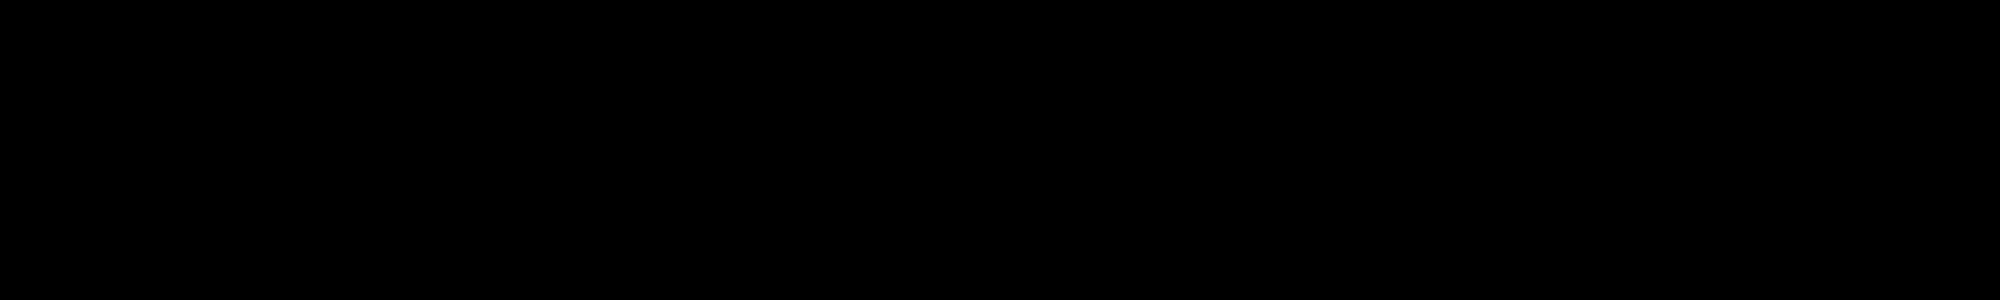 Sylvana